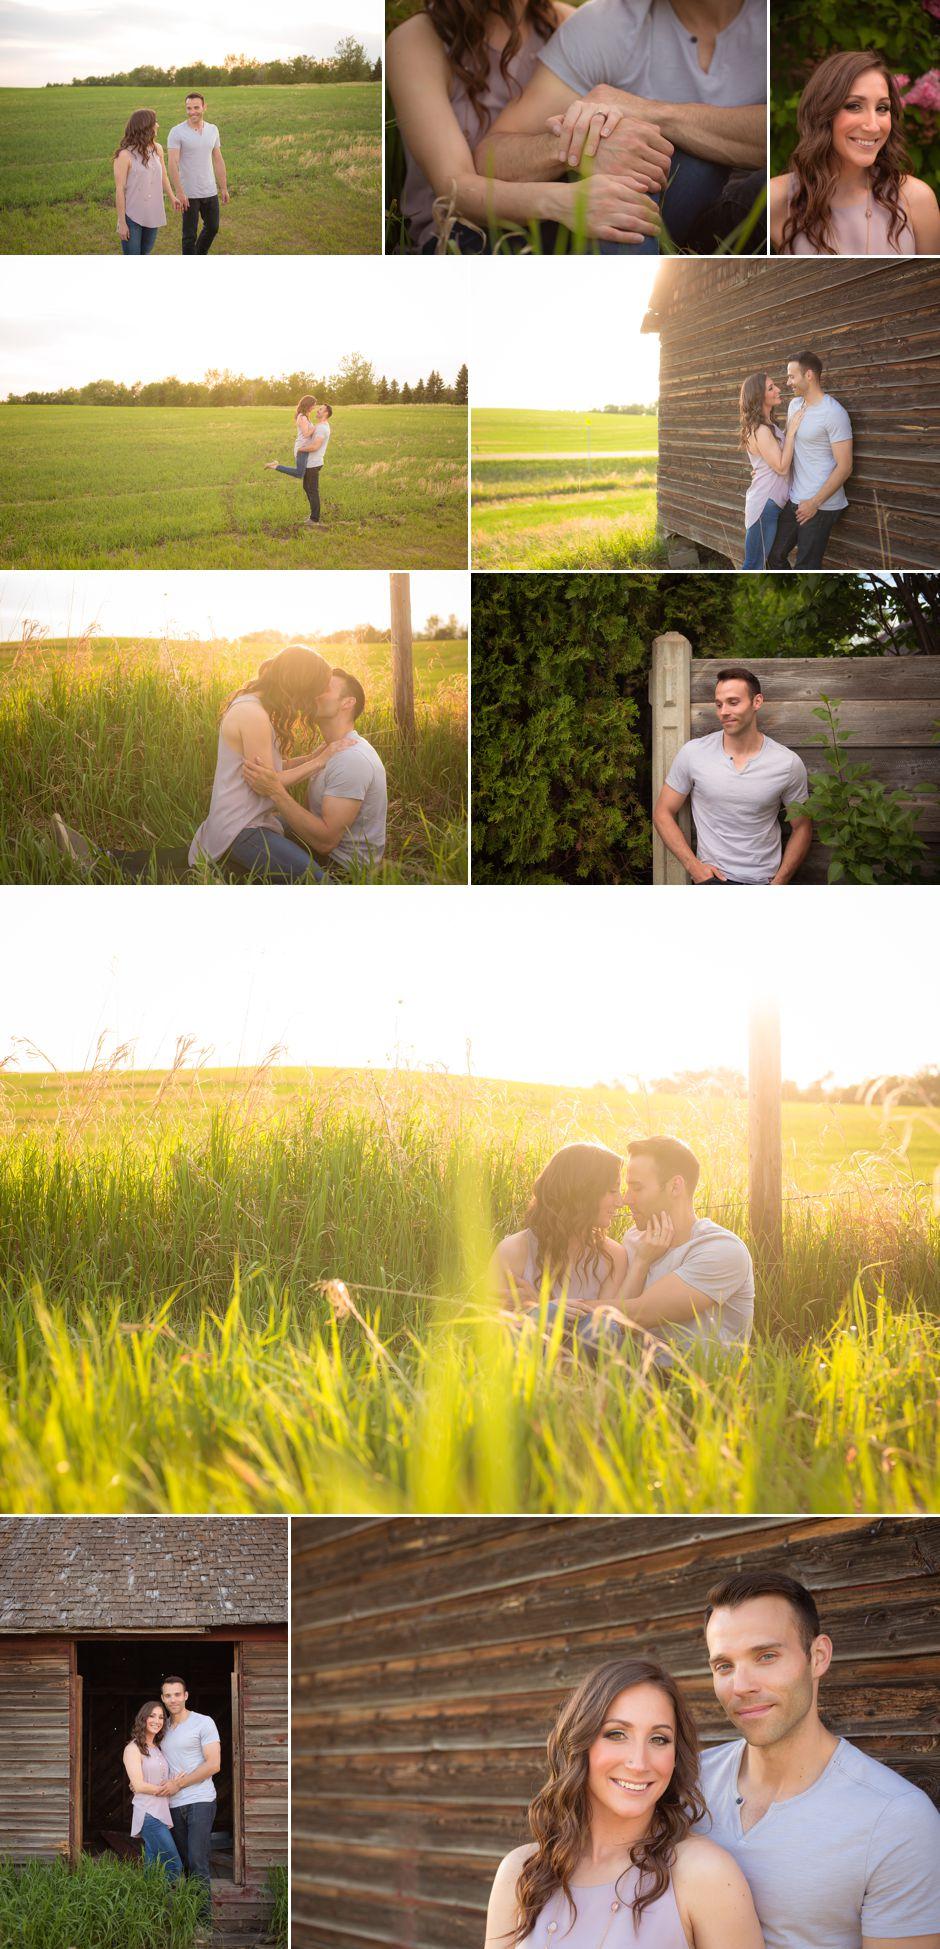 Edmonton Engagement Photographer Roughley Originals 3